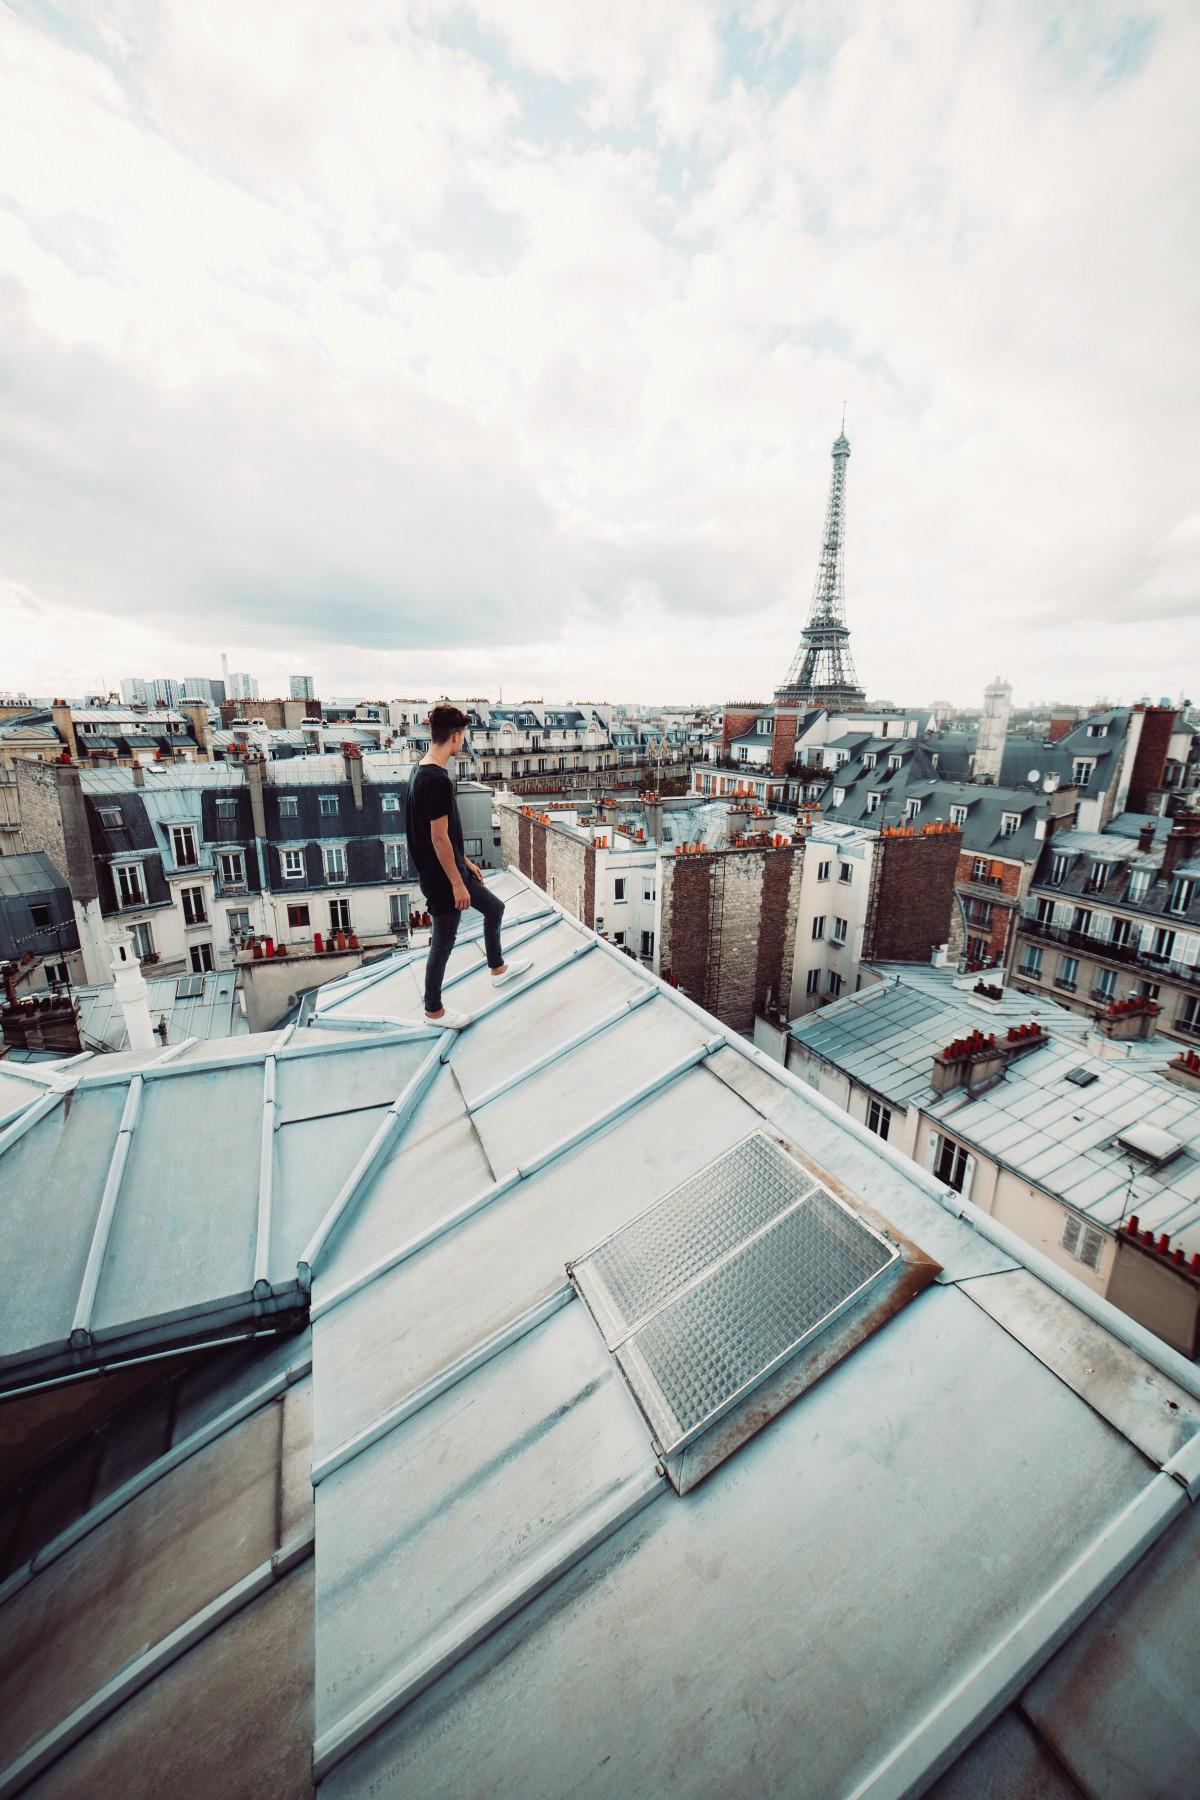 Выход с крыши картинка